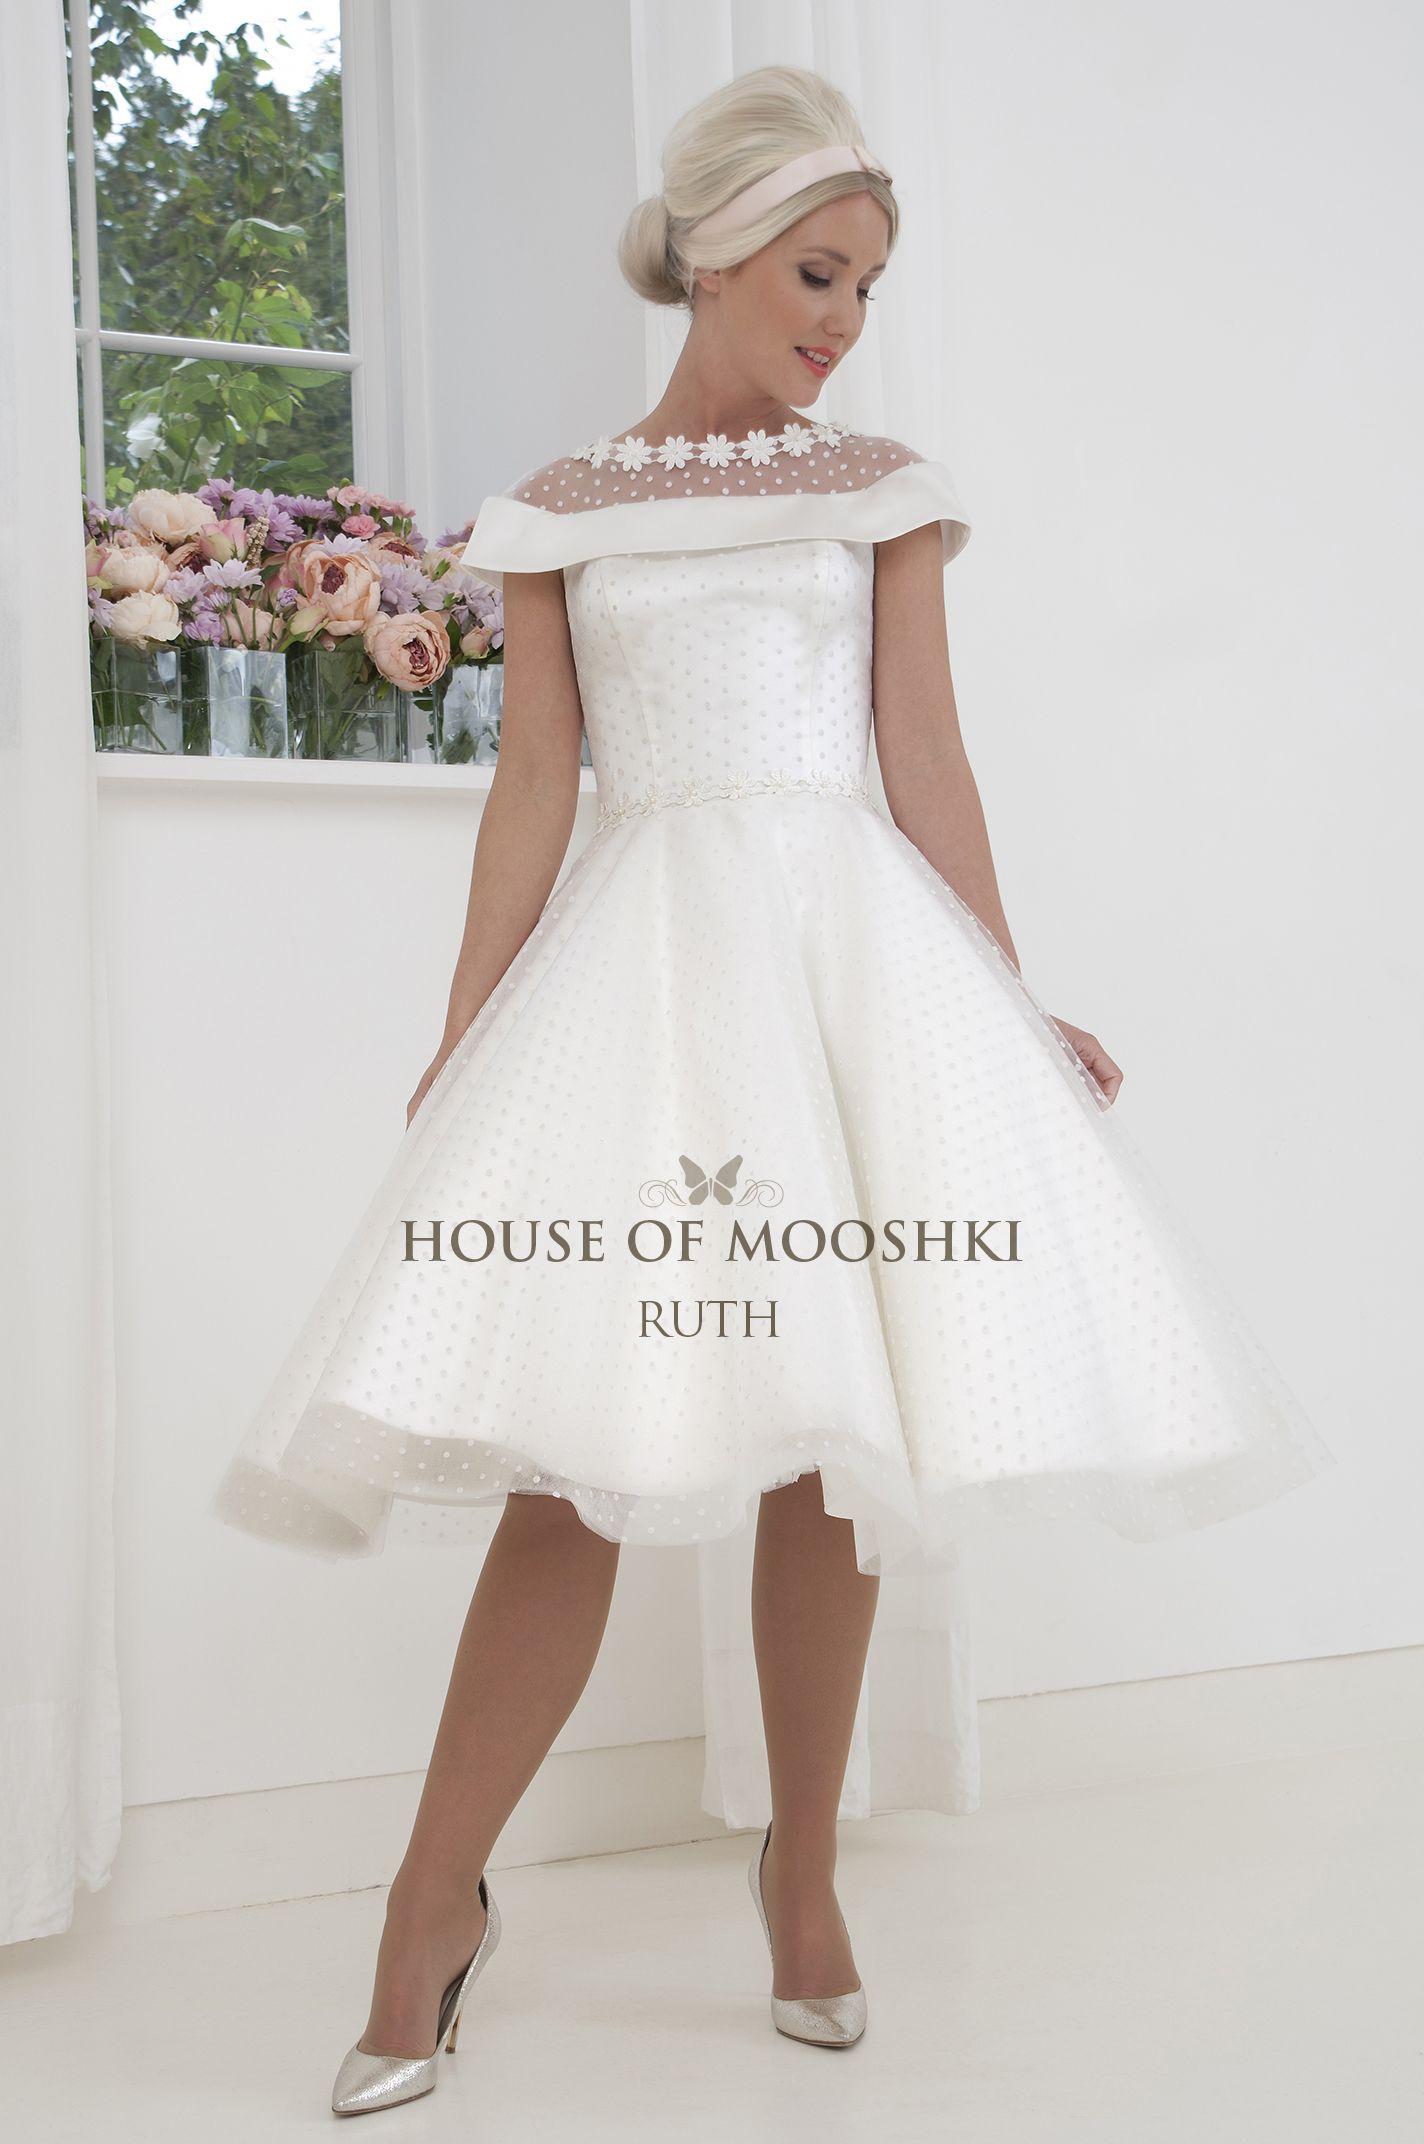 Super Cute Spotty Short Tea Length Wedding Dress With Bardot Neckline And Illusion Across The Sh Wedding Dresses Tea Length Wedding Dress Perfect Wedding Dress [ 2144 x 1424 Pixel ]